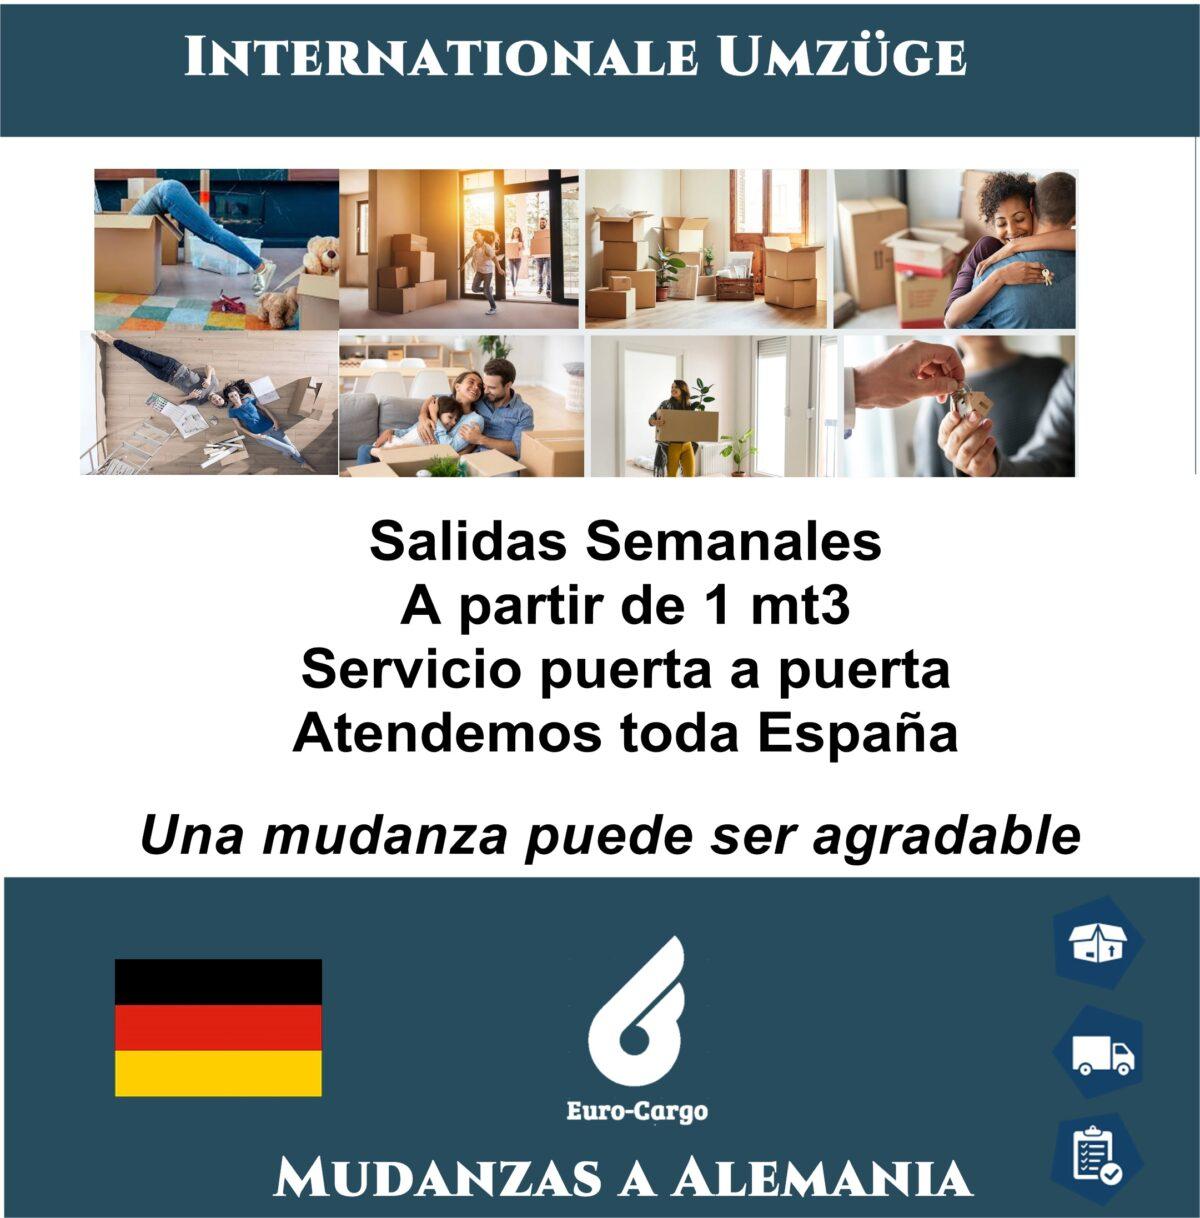 Mudanzas-a-Alemania-1200x1218.jpg